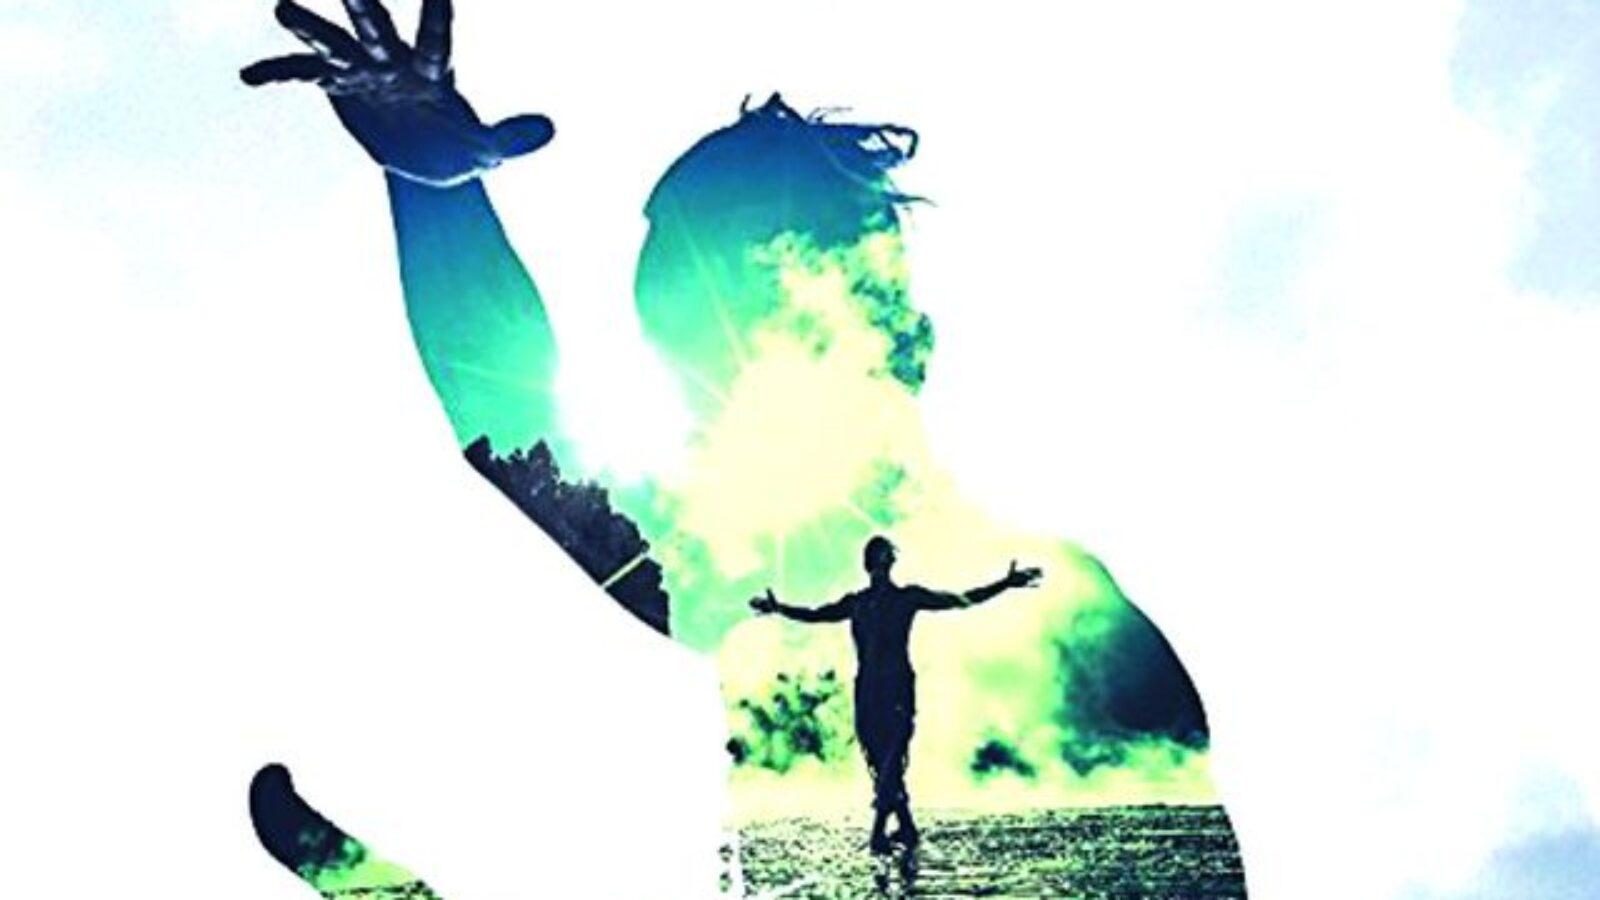 OXMOX CD-Tipp: XAVIER RUDD – Live In The Netherlands